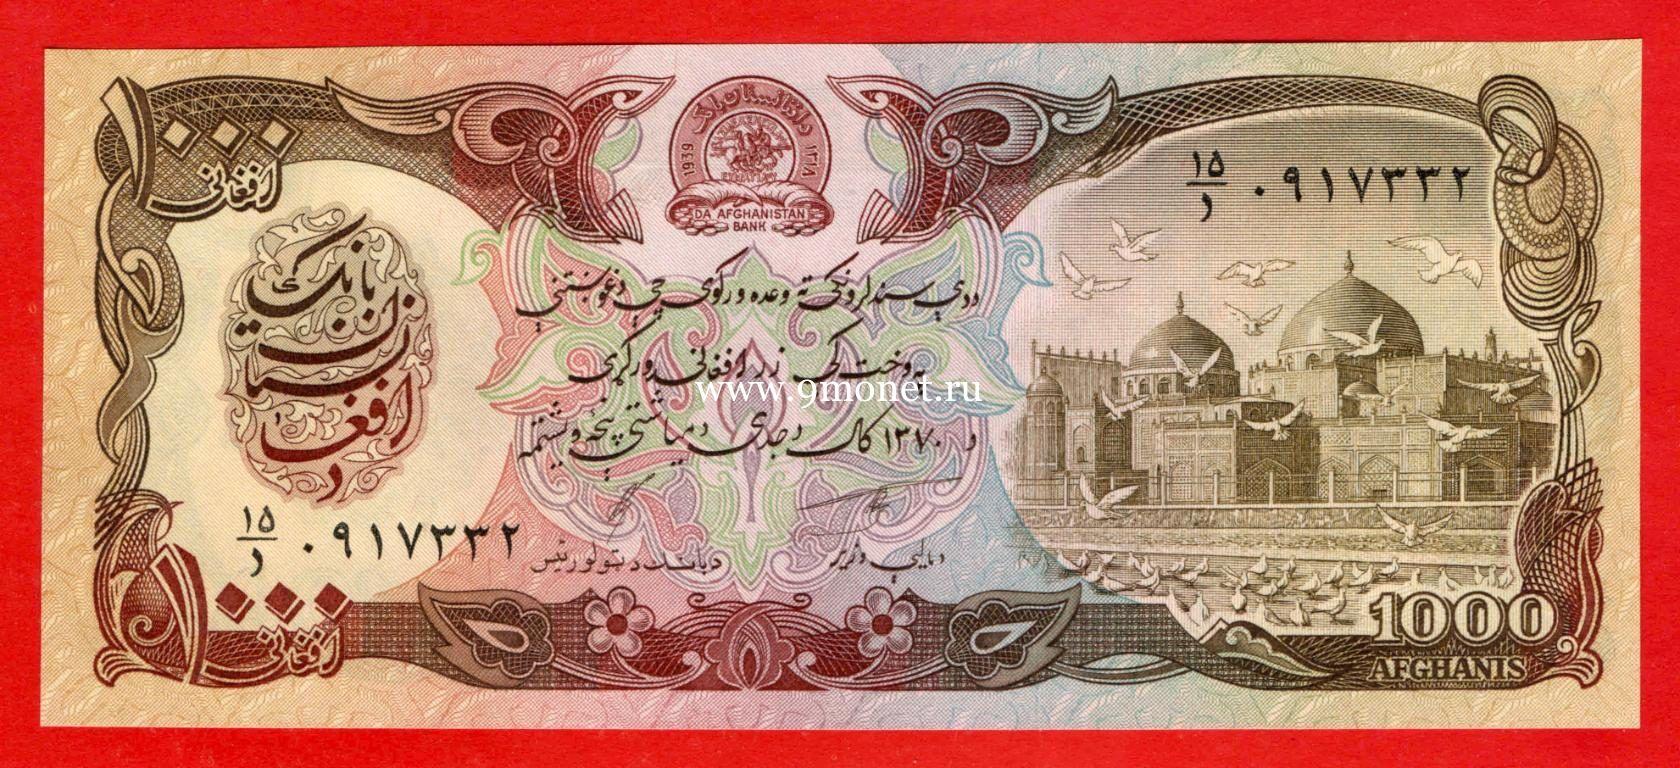 Афганистан банкнота 1000 Афгани 1993 года.